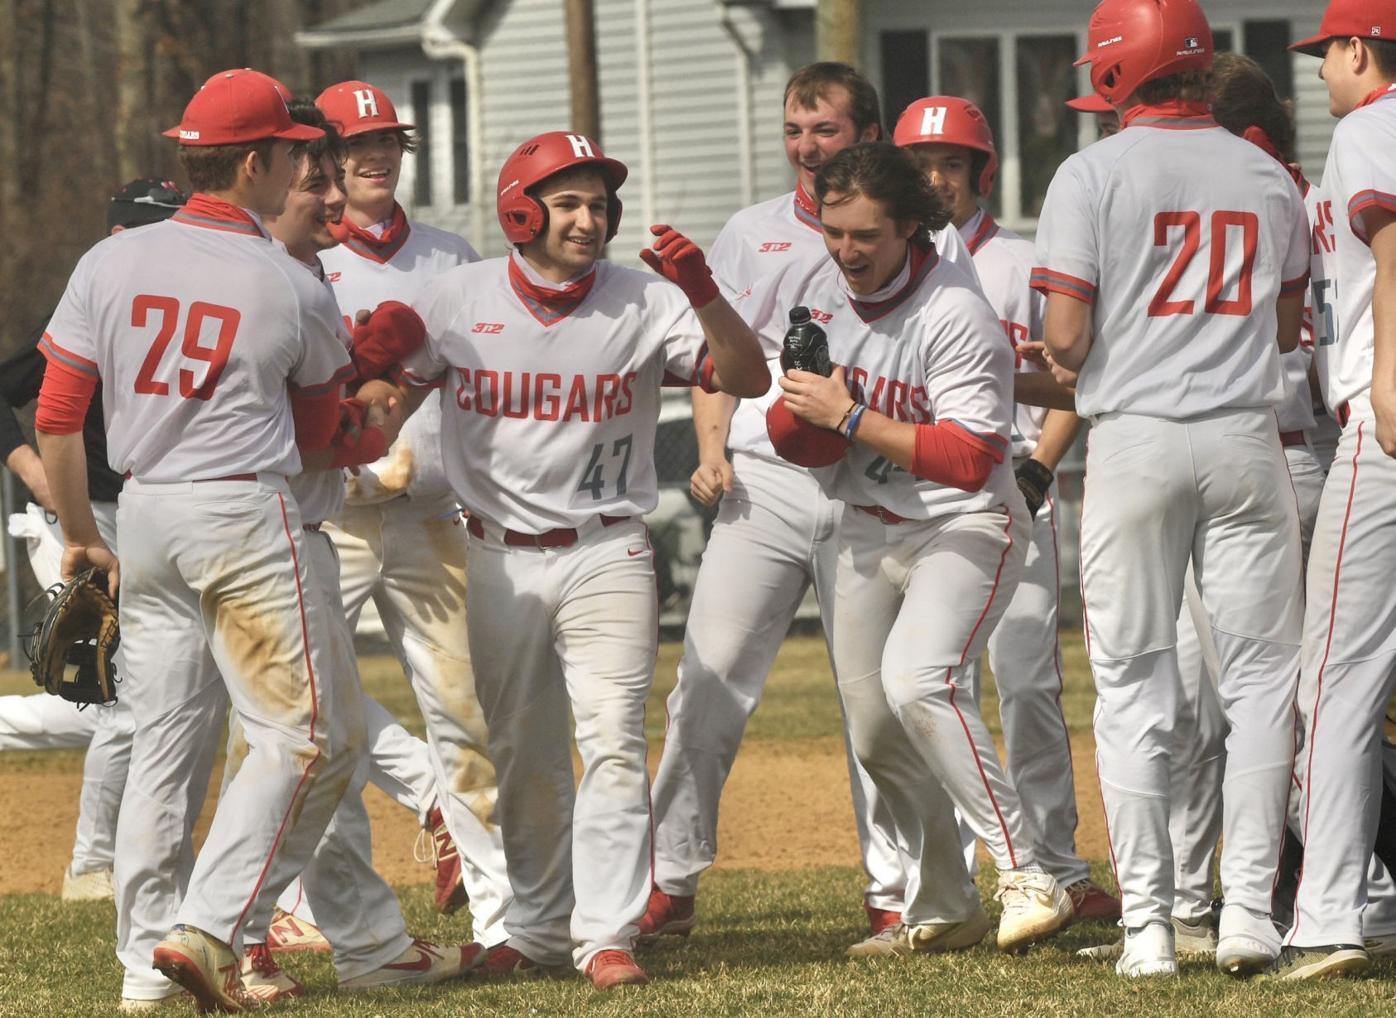 HIGH SCHOOL BASEBALL: Cougars outlast North Pocono in wild season opener